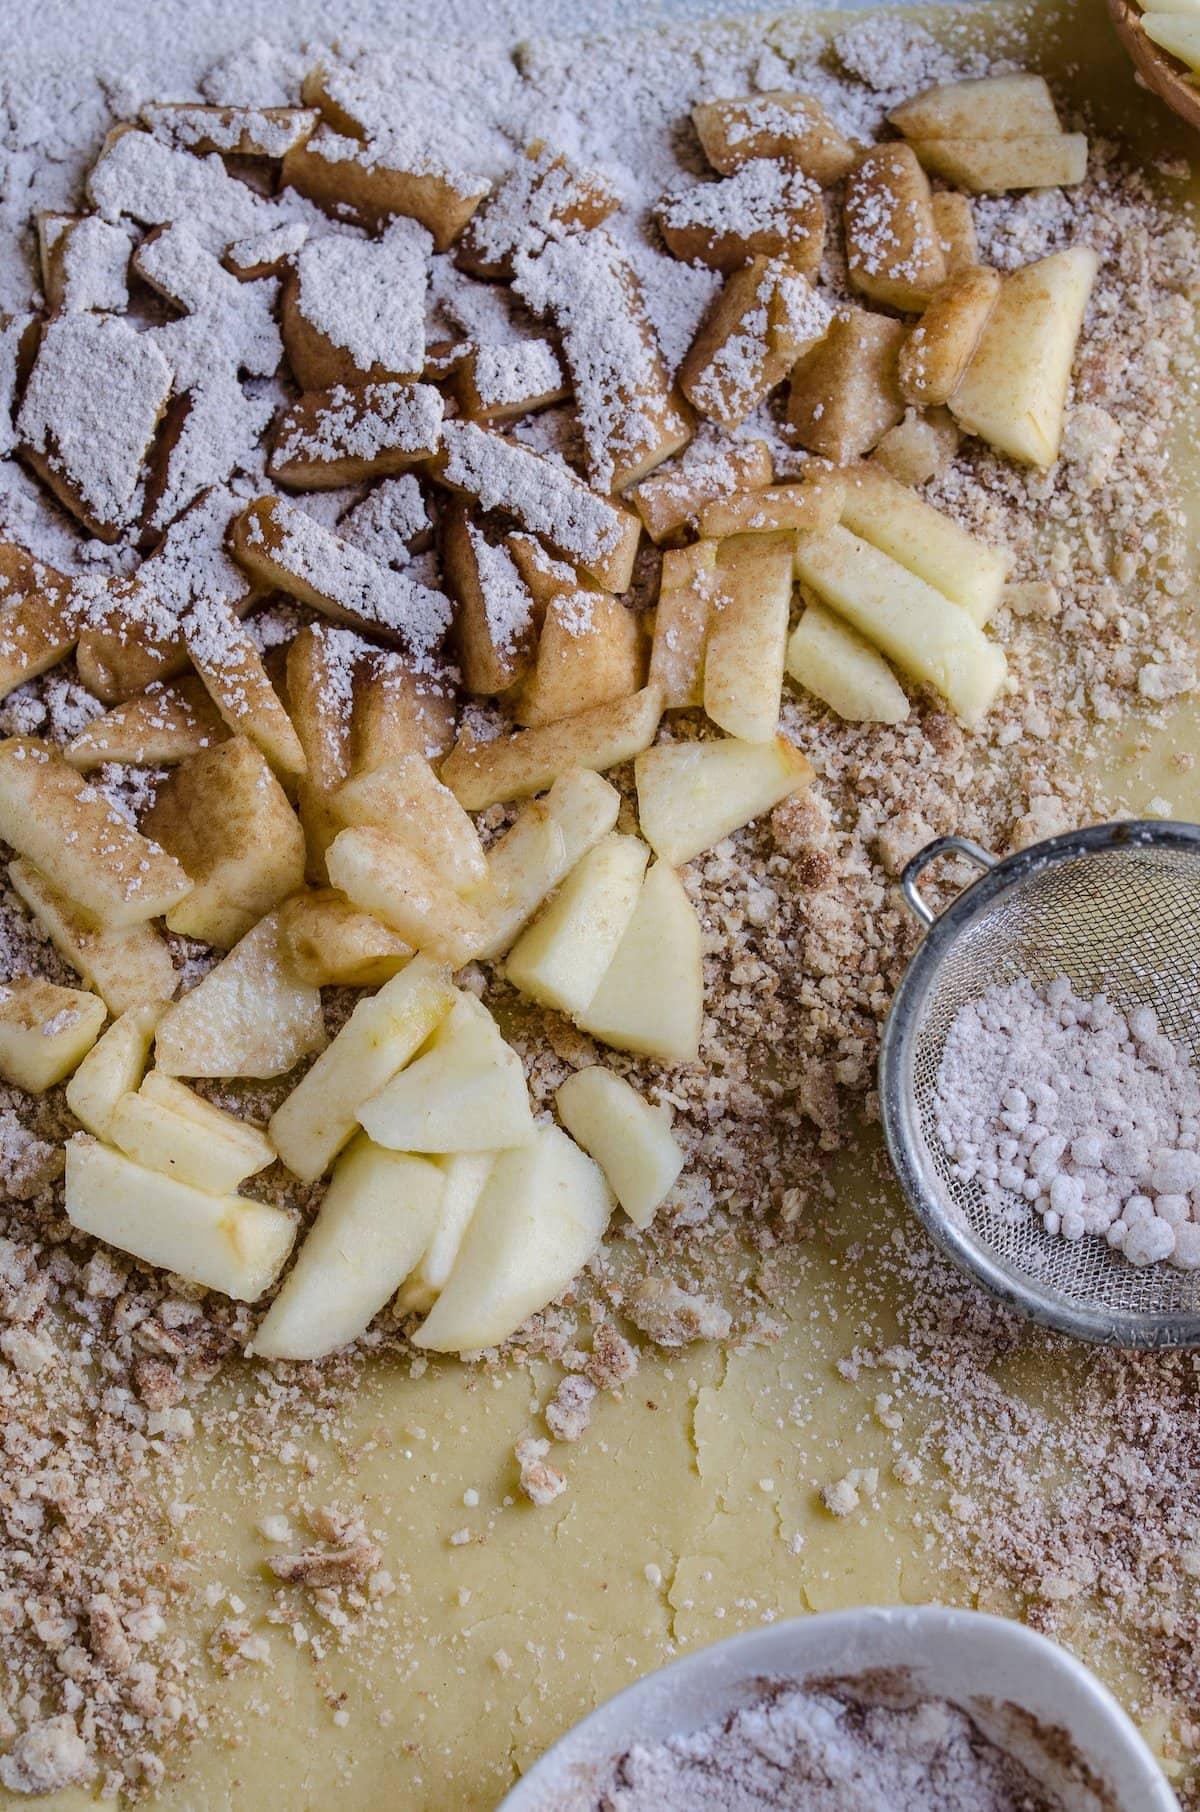 Apple slices in cinnamon sugar.